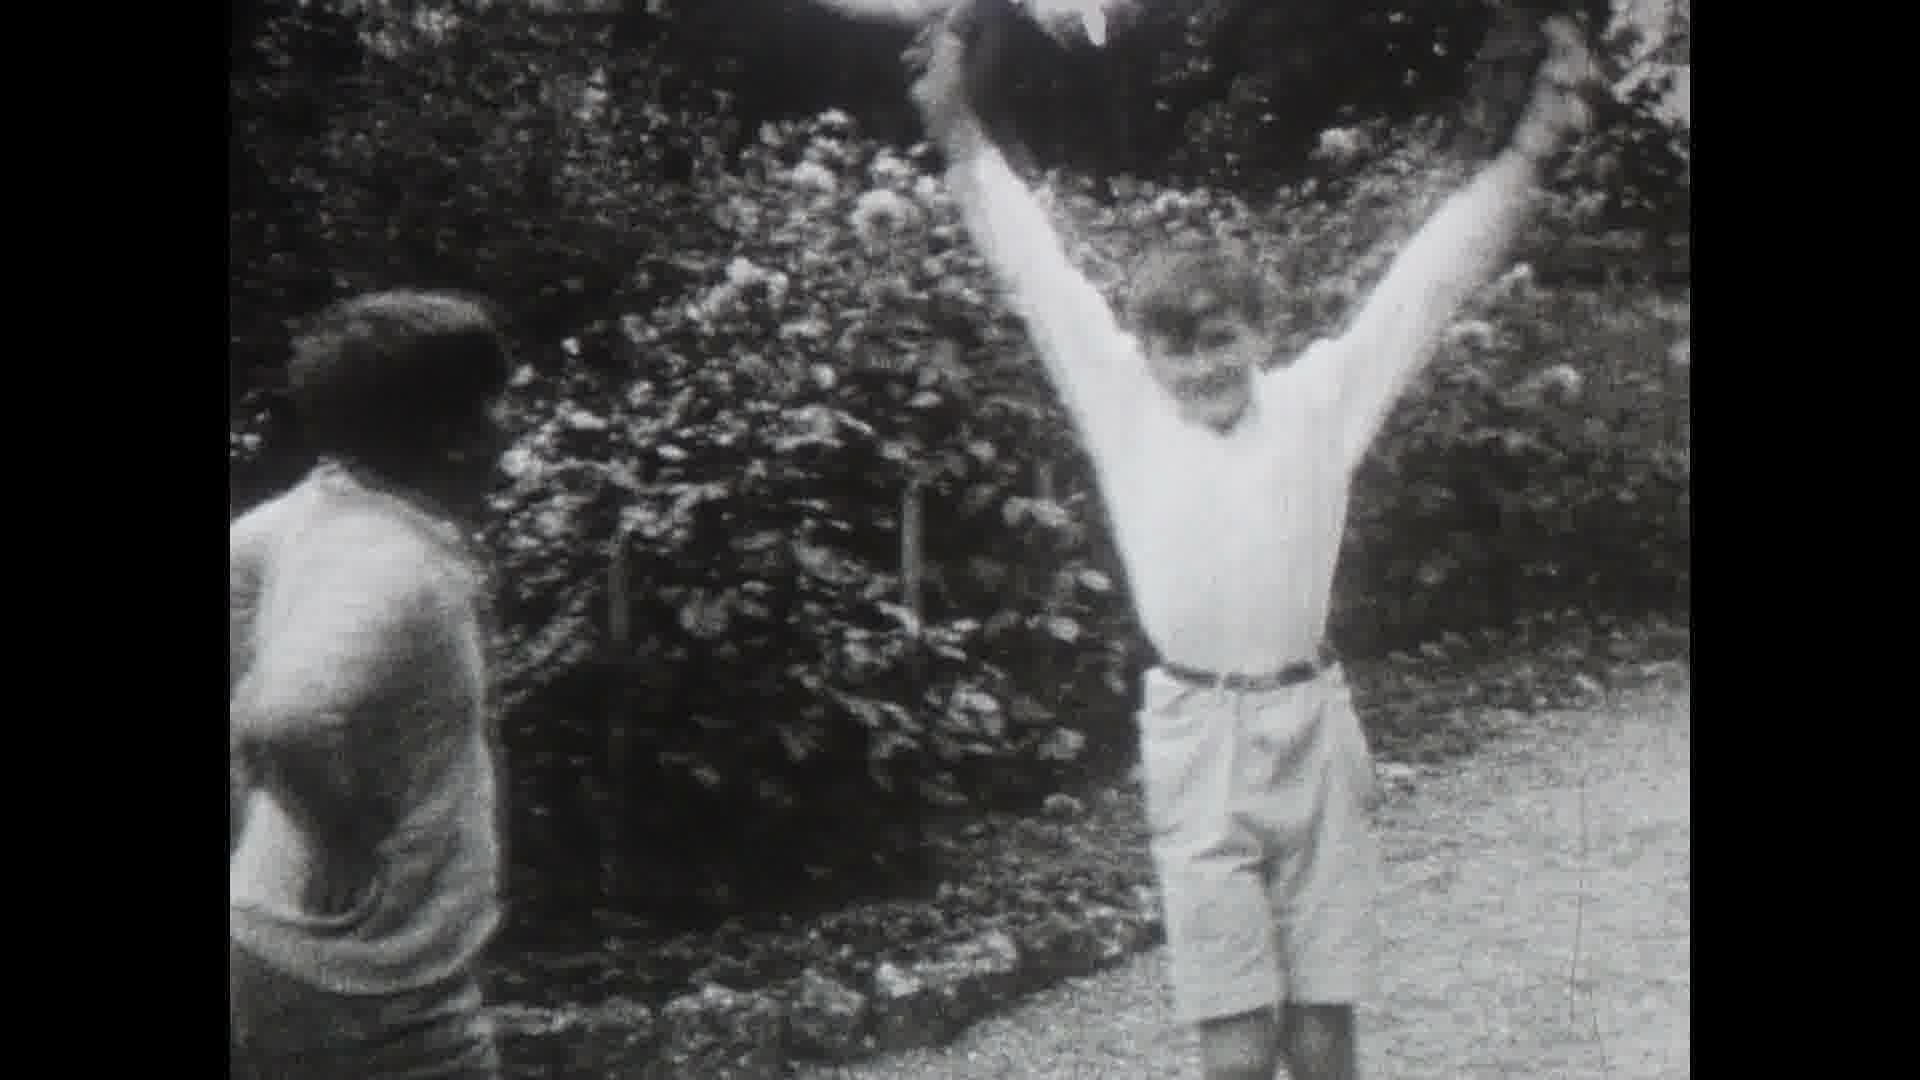 Corde à sauter, août 1930